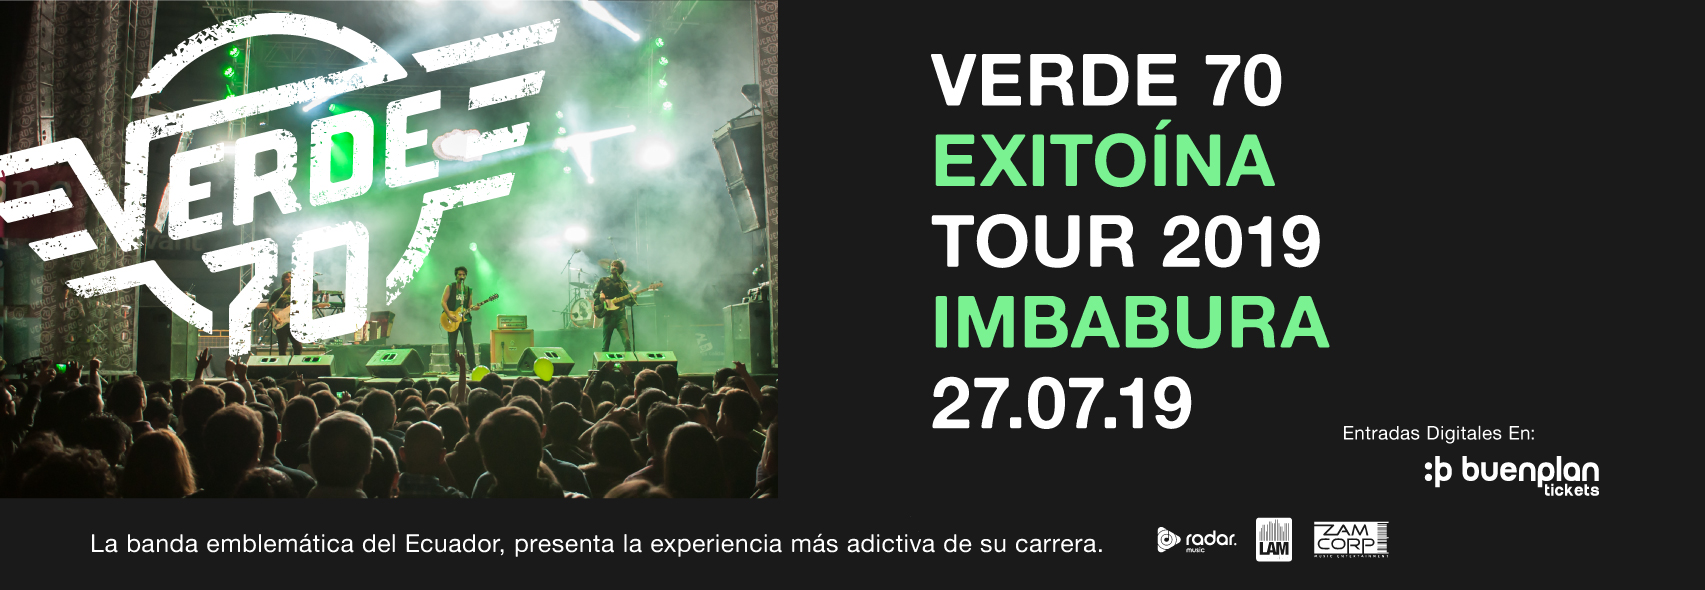 Verde 70 Exitoína Tour - Imbabura en Otavalo, BuenPlan